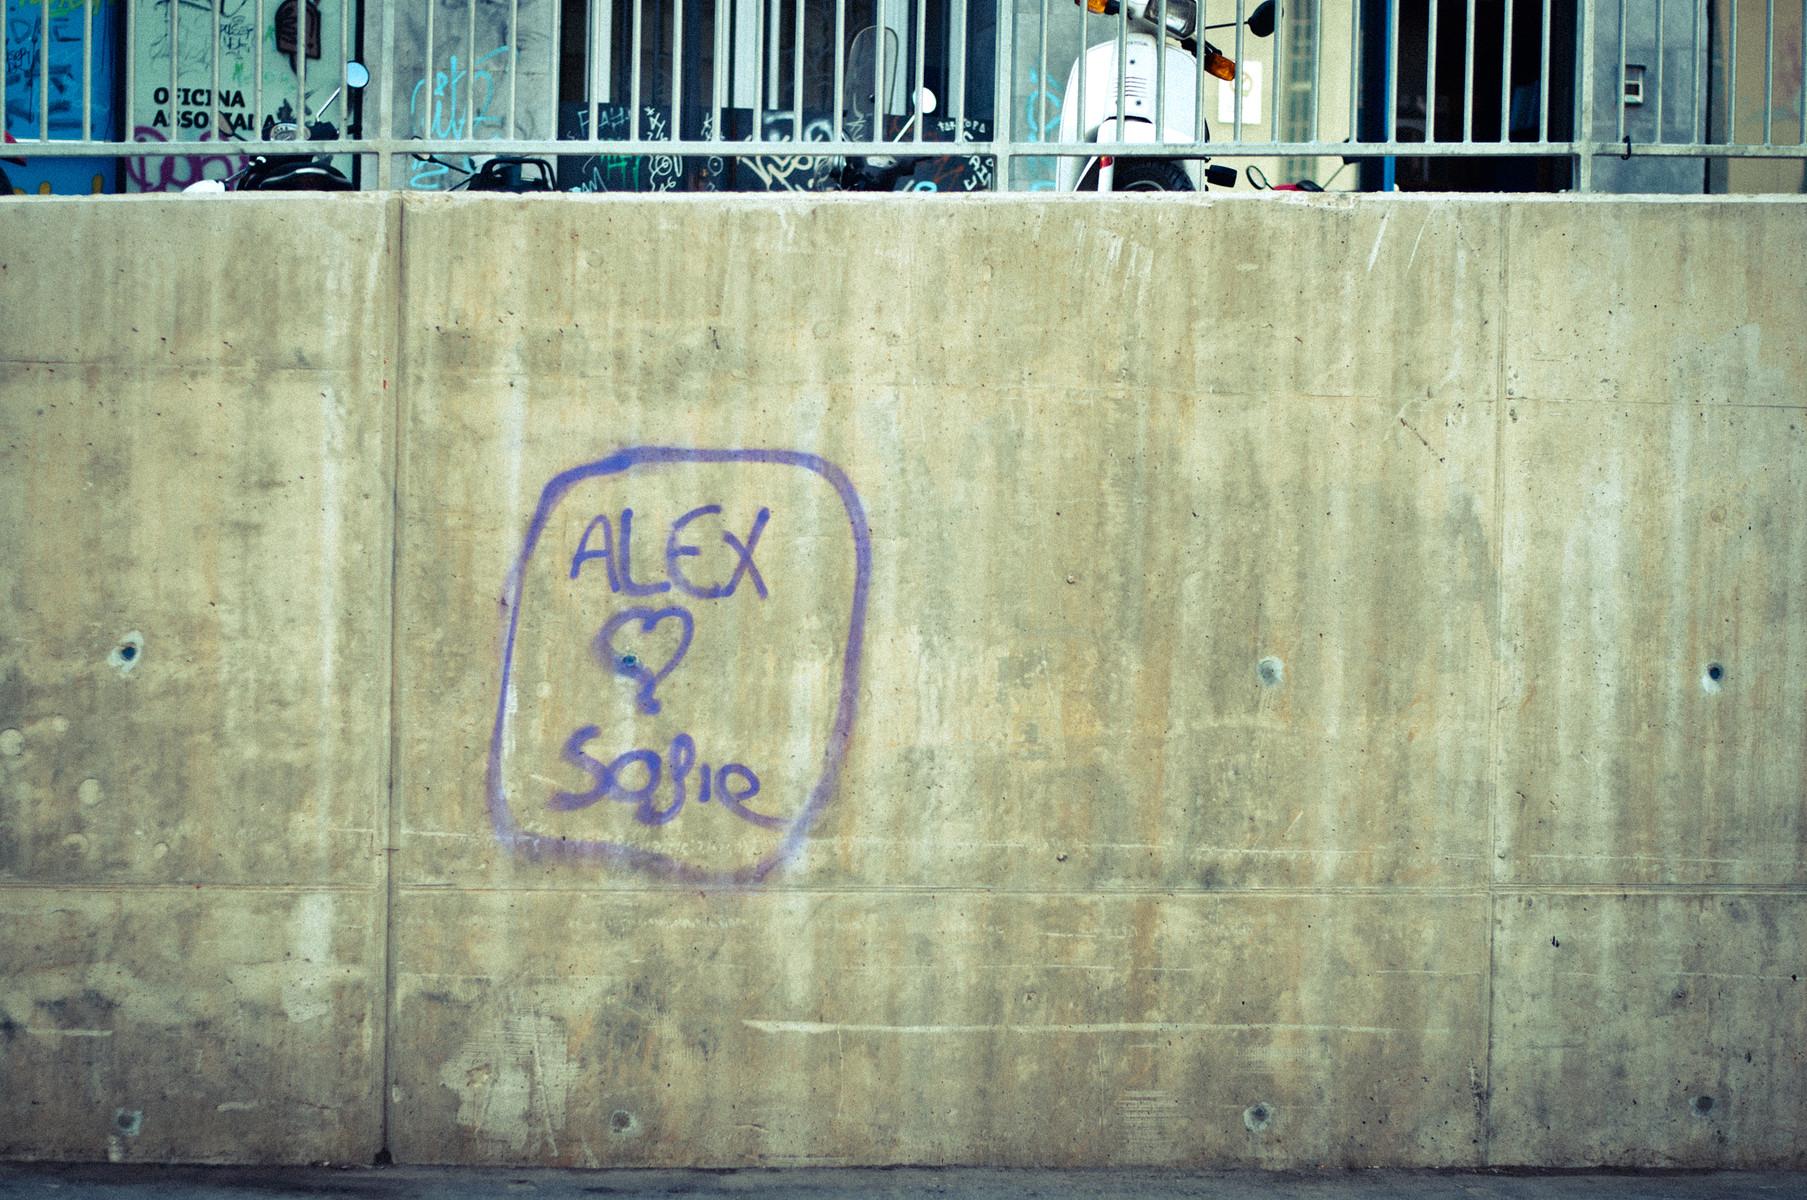 ...but does sofie <3 Alex?